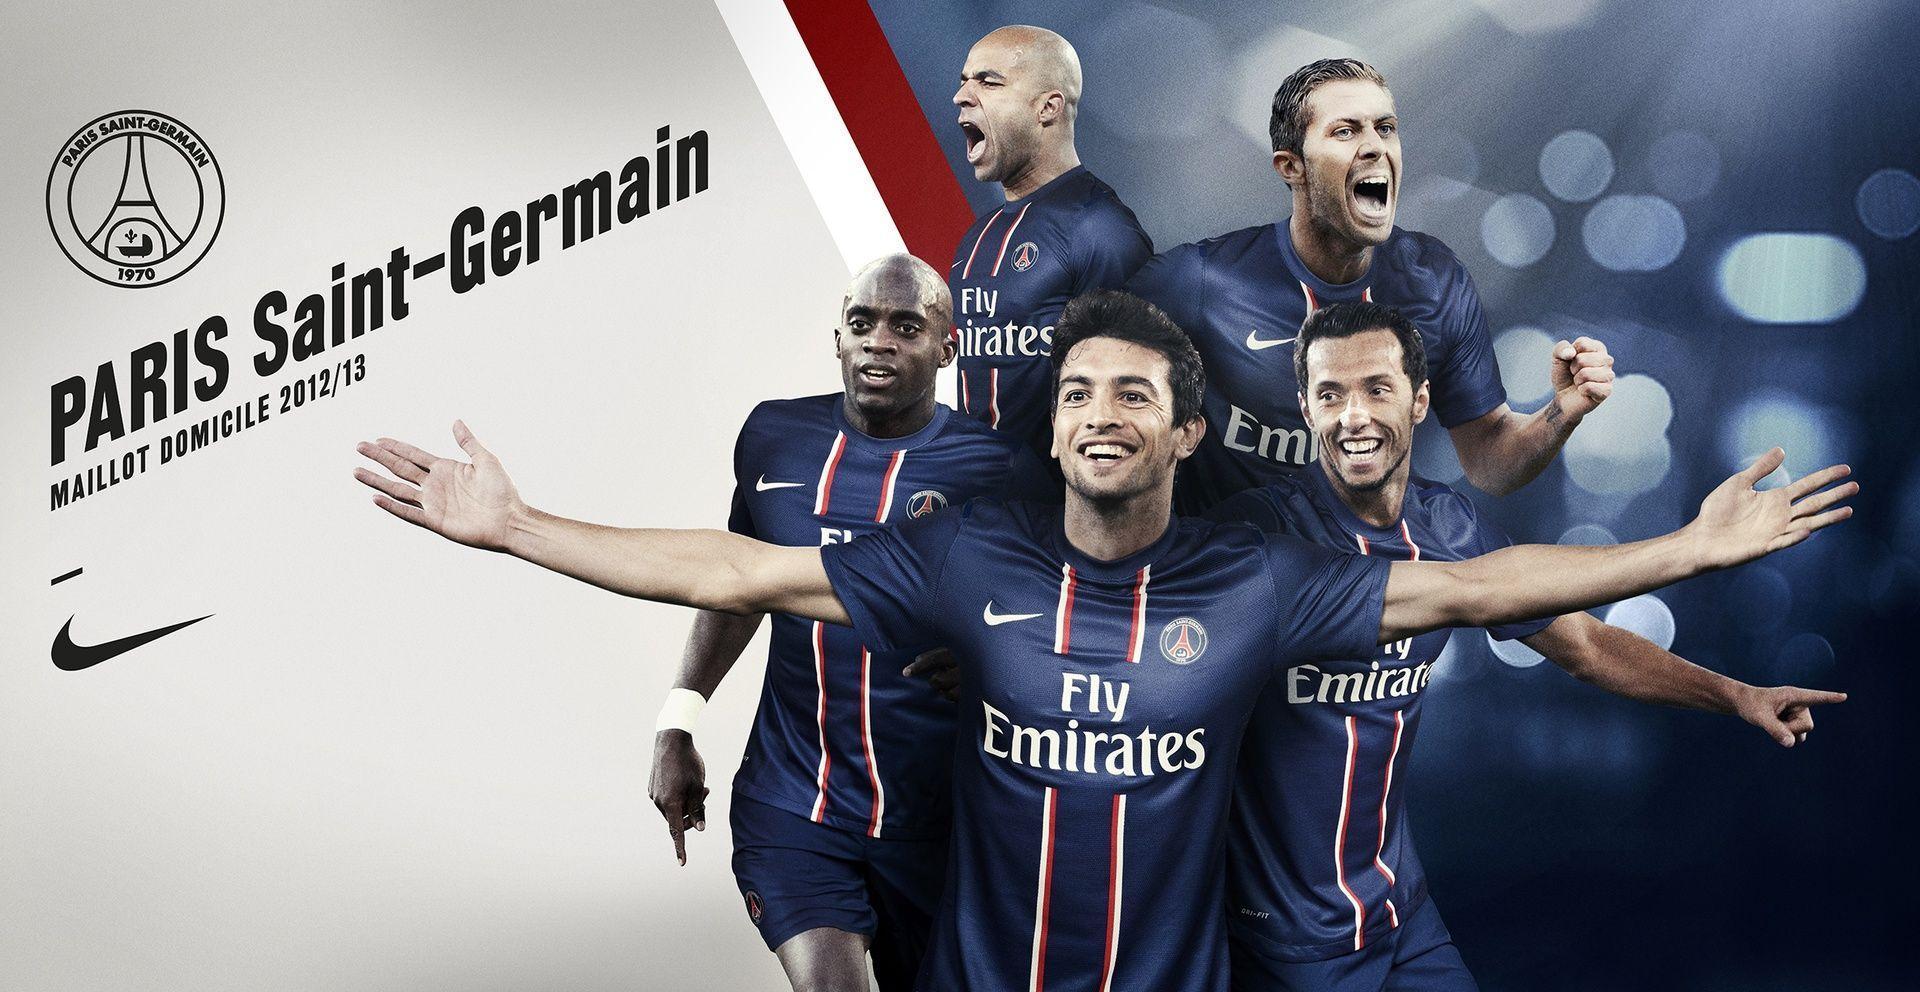 Paris Saint-Germain F.C. Zoom Background 5